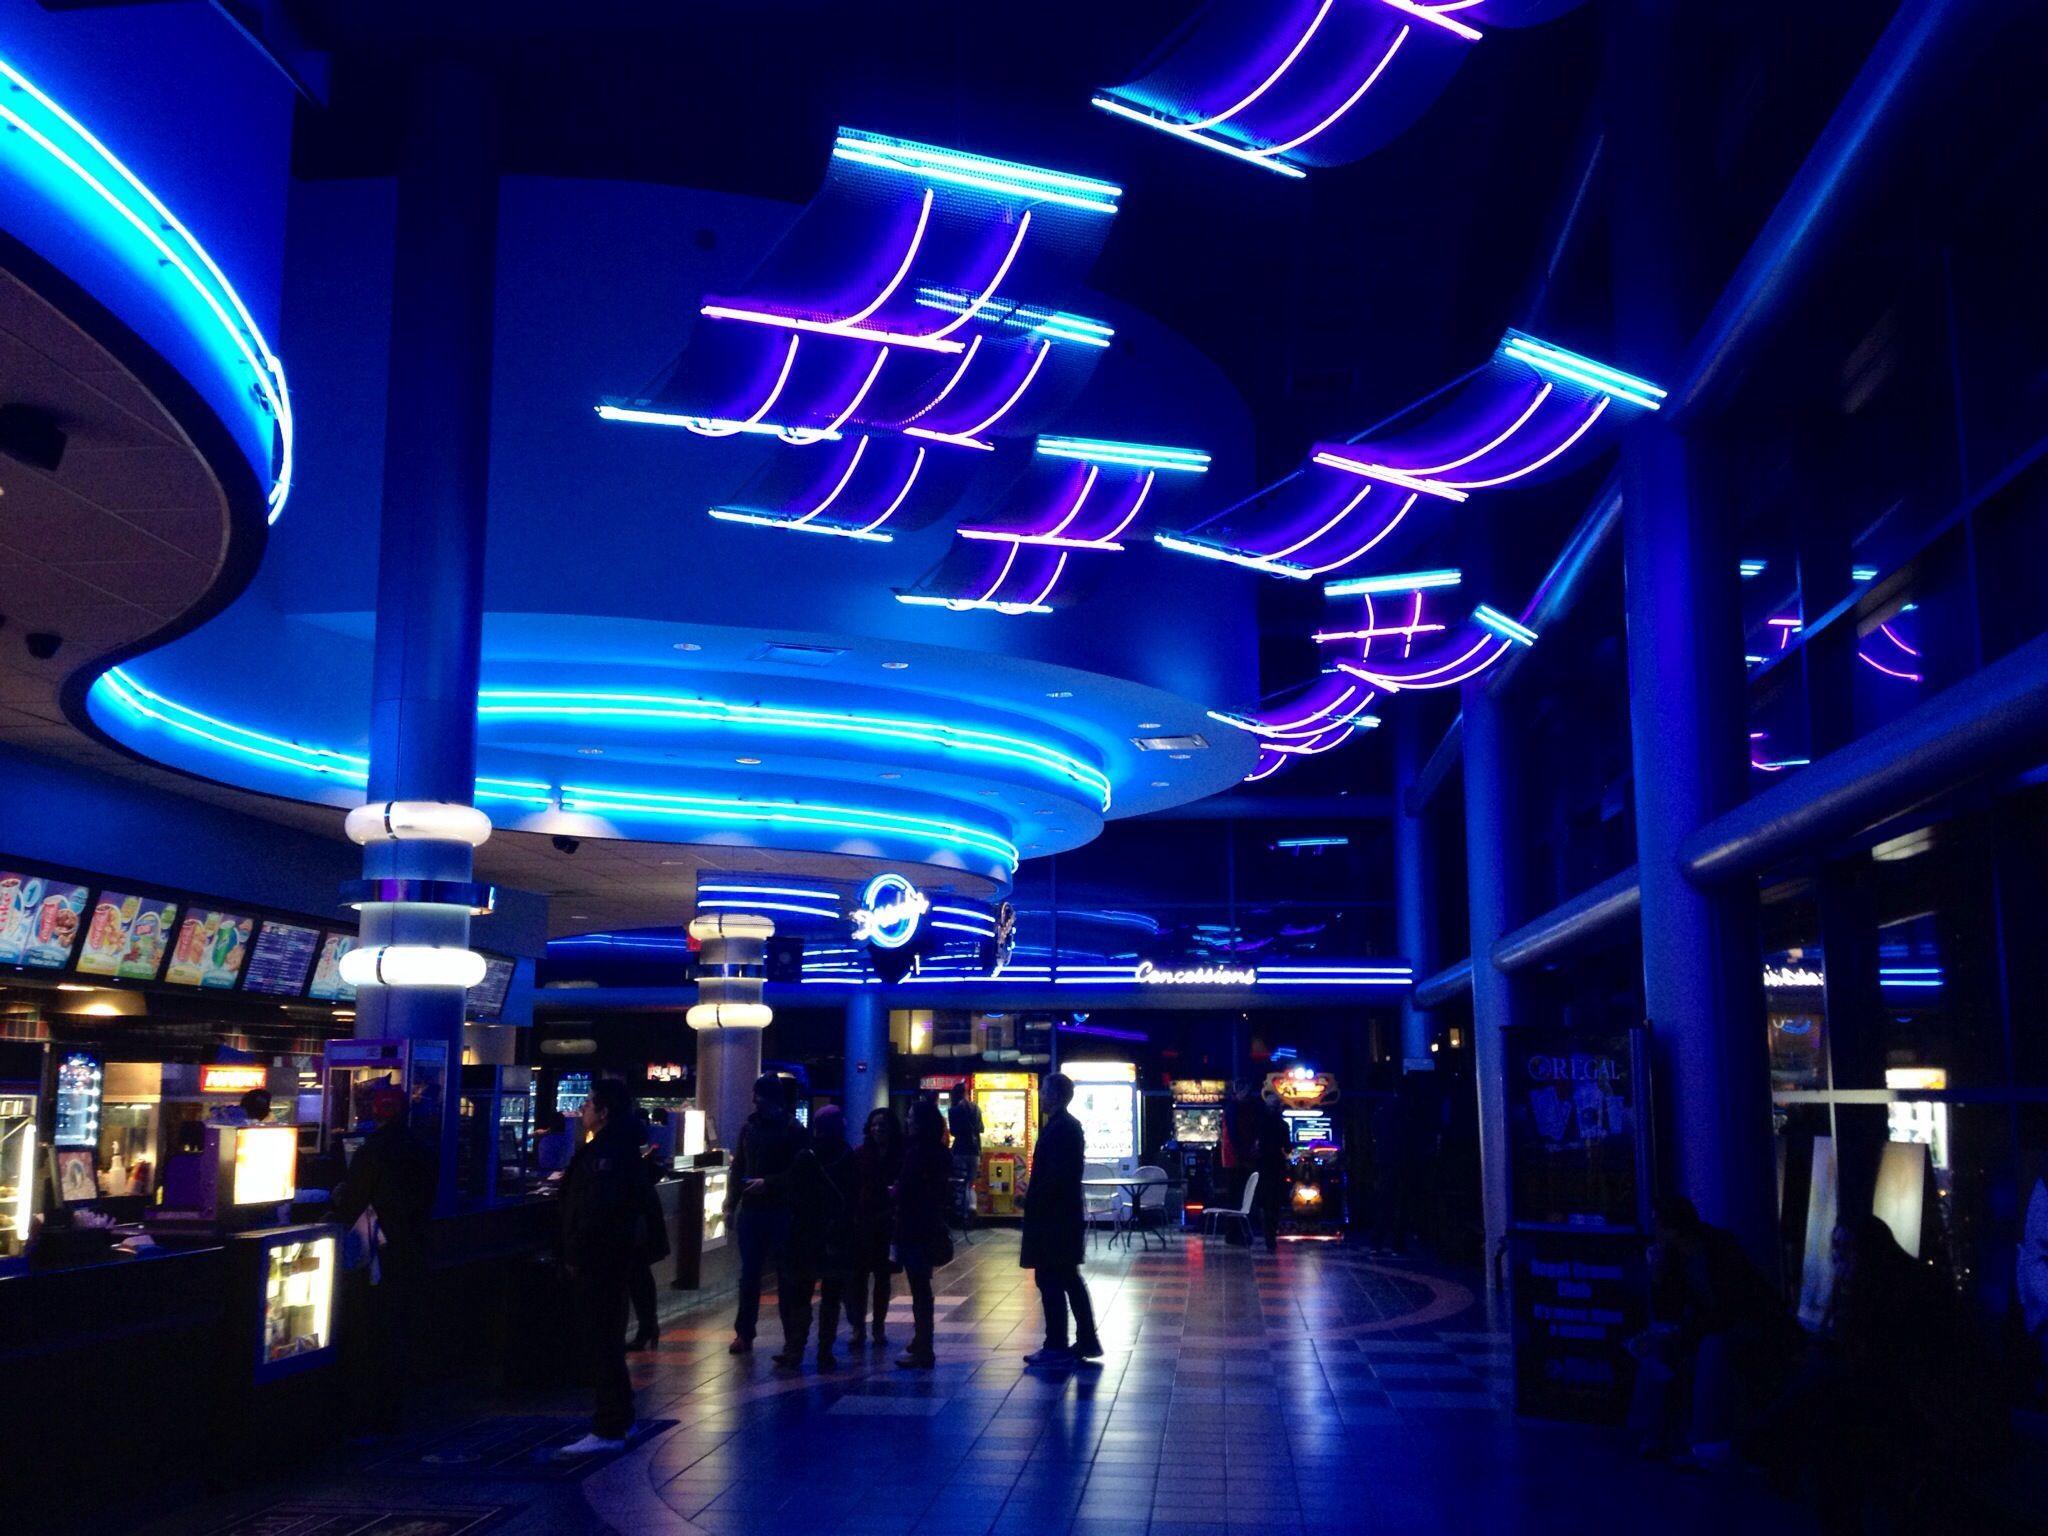 Theater Interior Google Search Abc 2016 Theaters